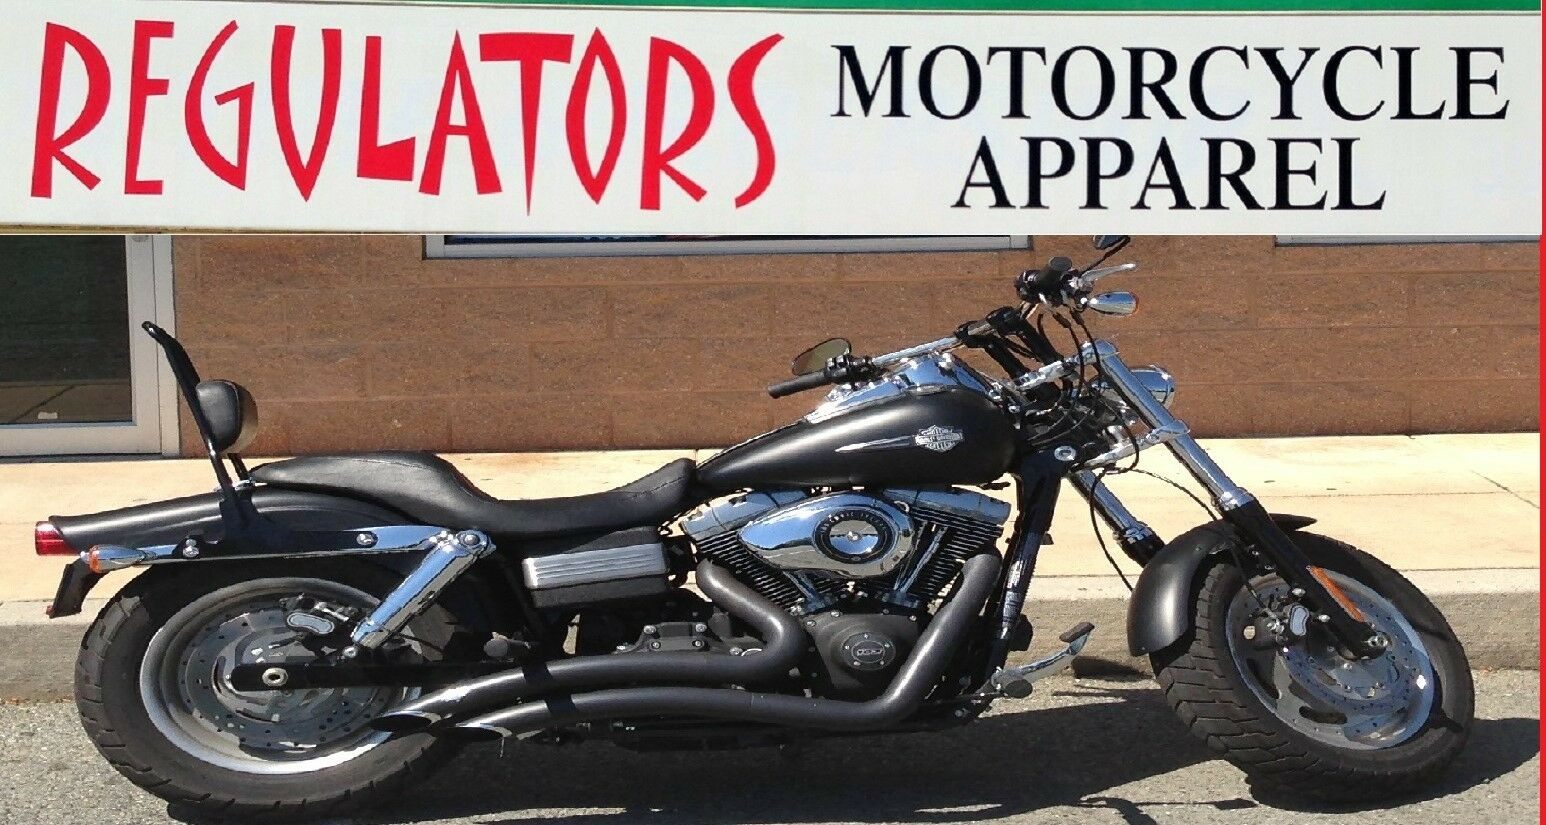 Regulators Motorcycle Apparel